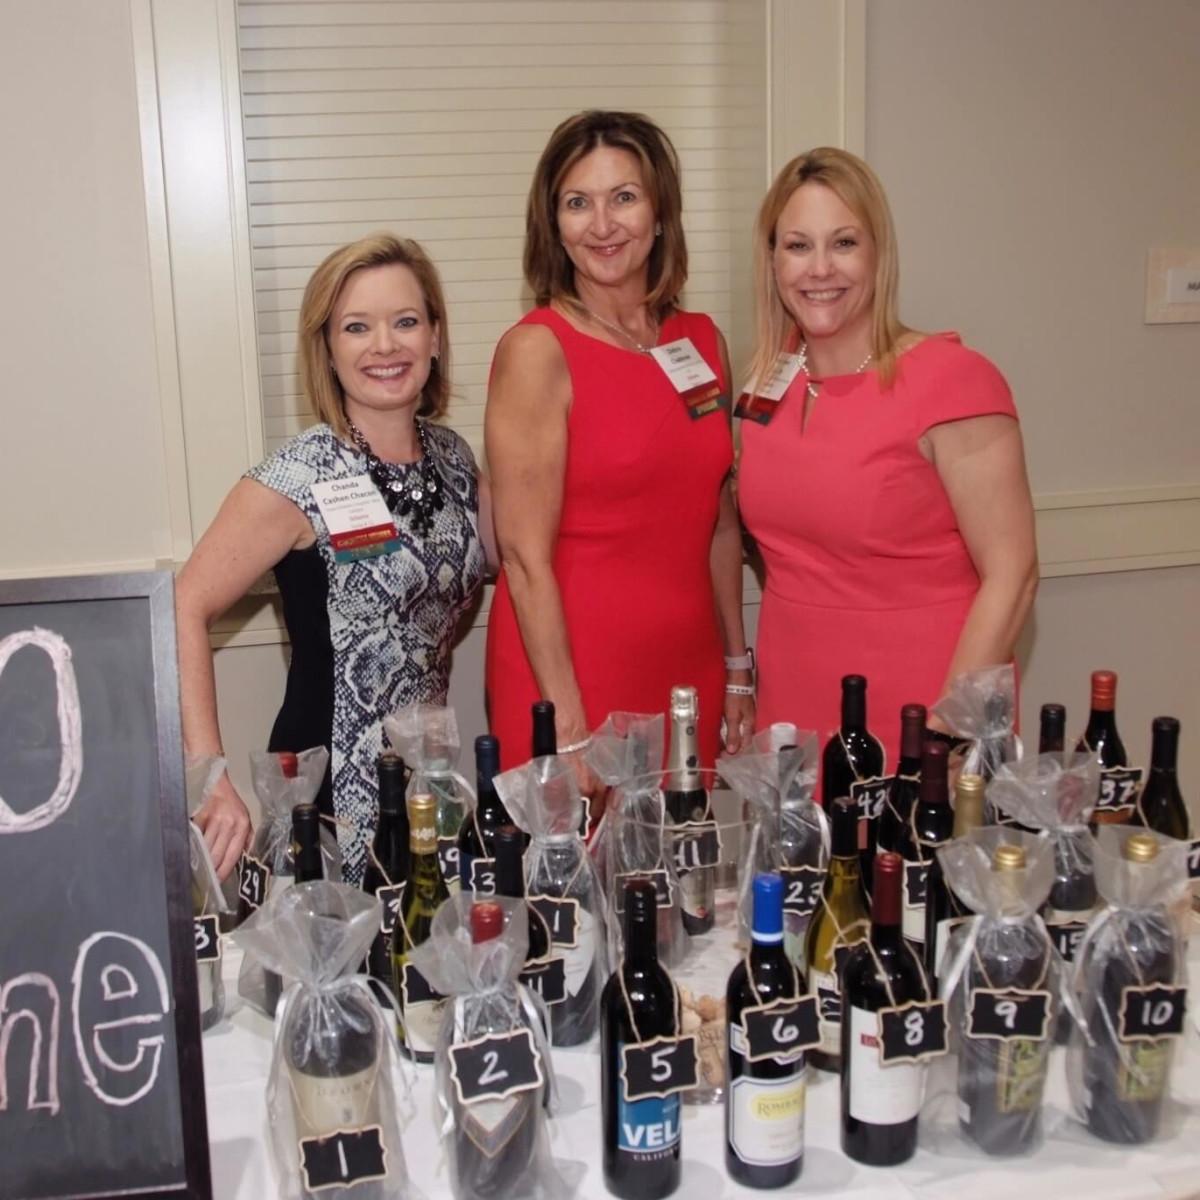 Women Driving Business 9/16 Chanda Cashen Chacon, Debra Crabtree, Megan Salch